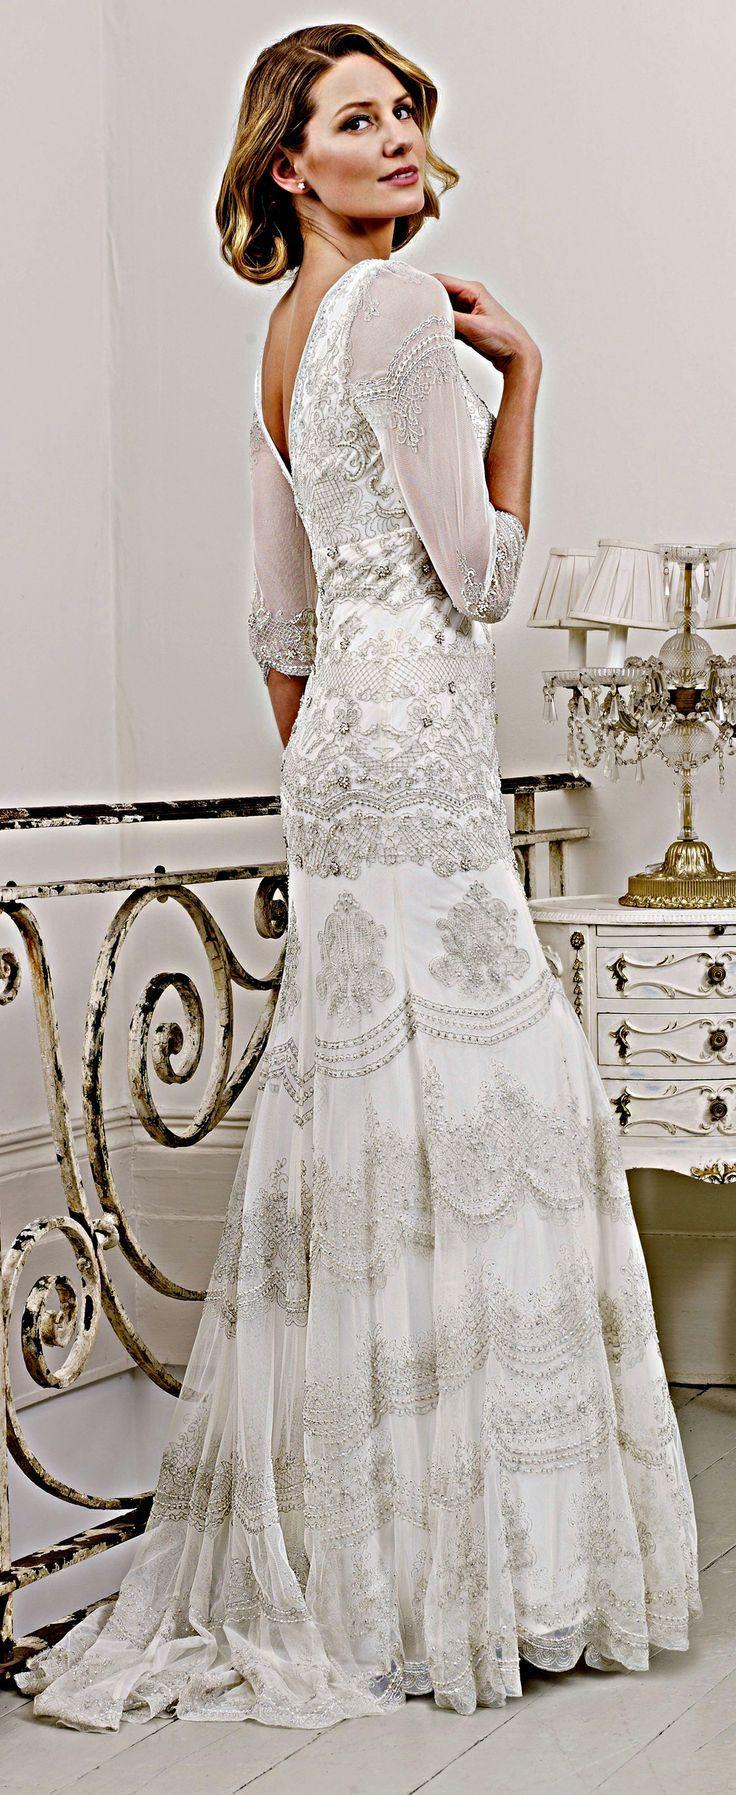 Dress for wedding party female  Pin by Marlene on Wedding dresses  Pinterest  Reception Wedding